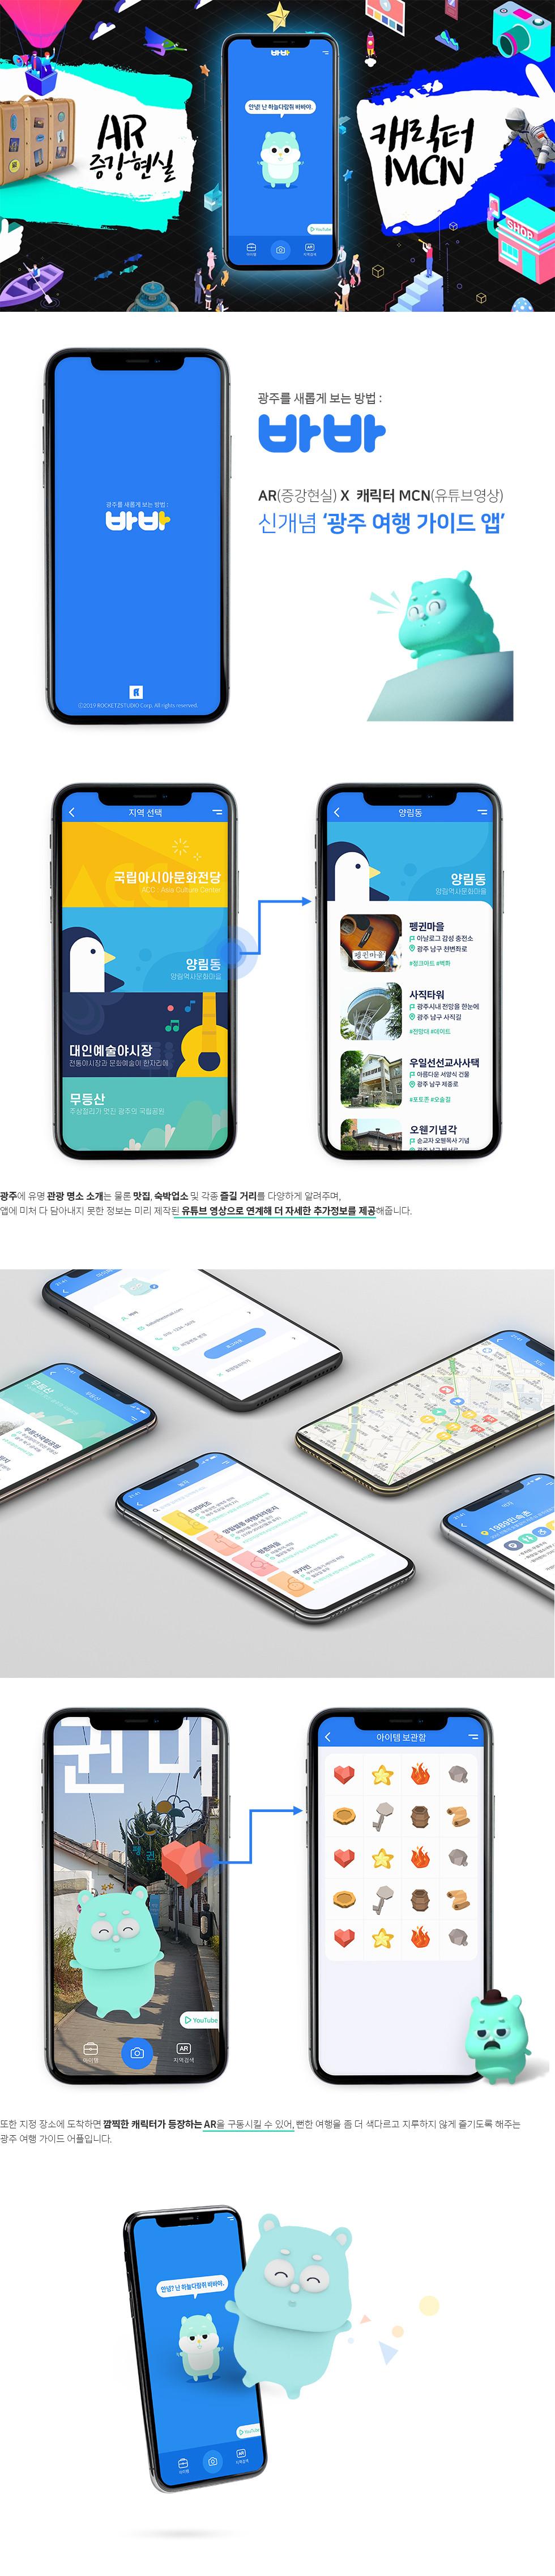 Baba_App_Info_2.jpg